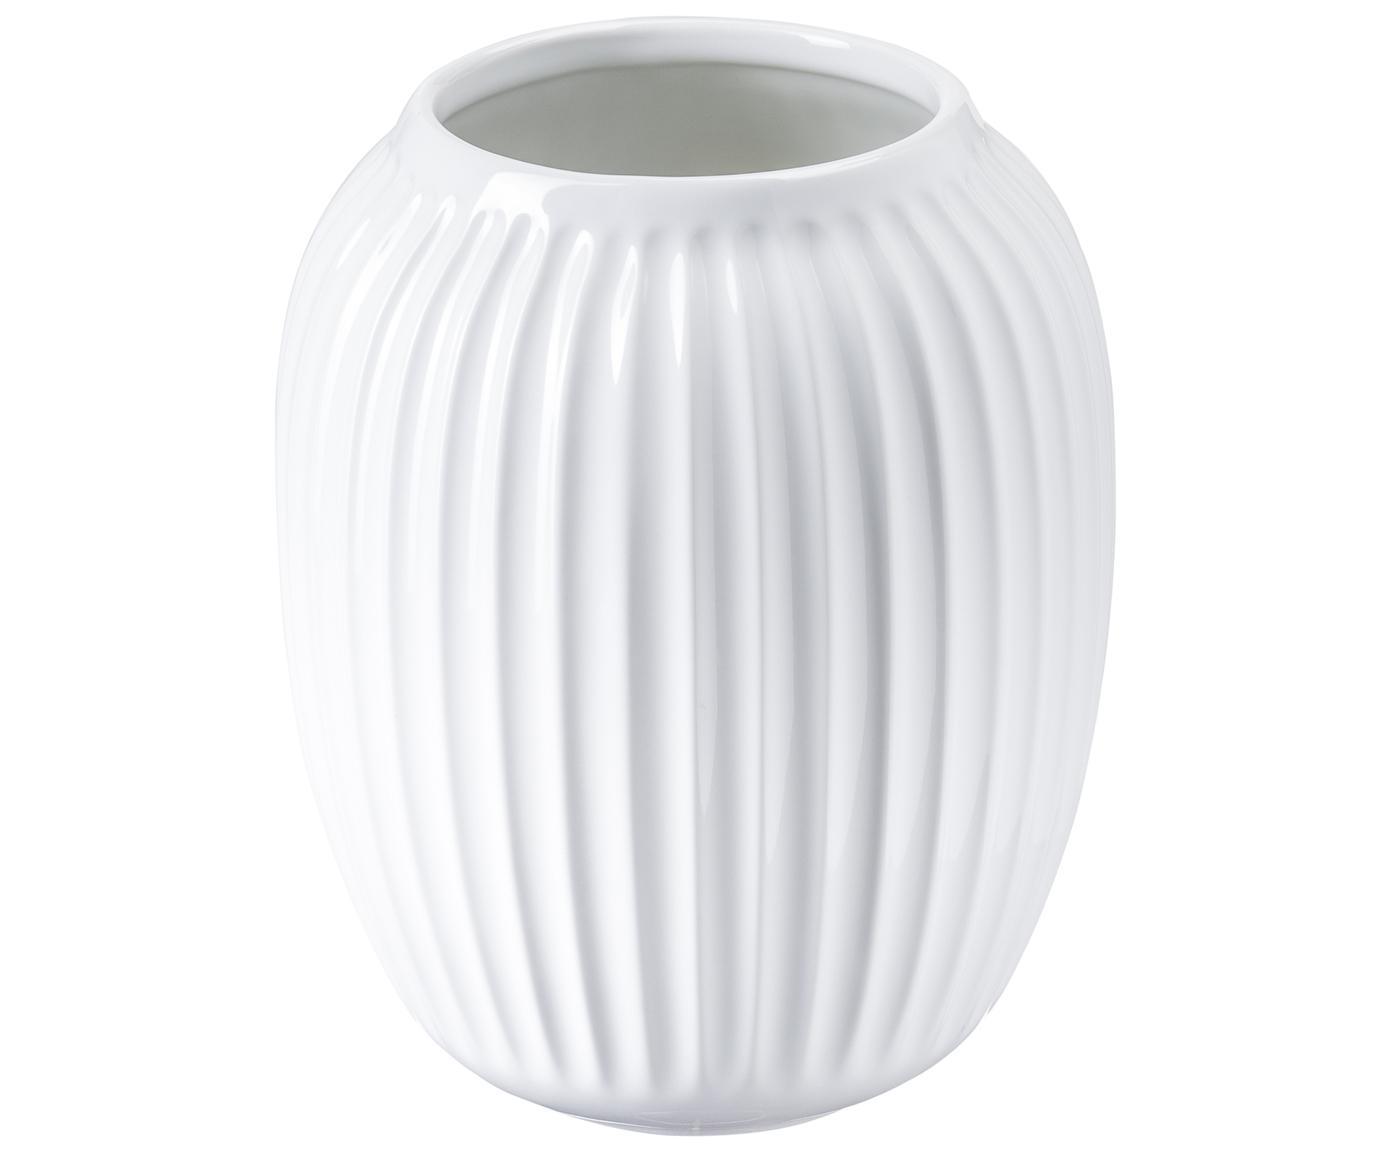 Jarrón artesanal de diseño Hammershøi, Porcelana, Blanco, Ø 17 x Al 20 cm